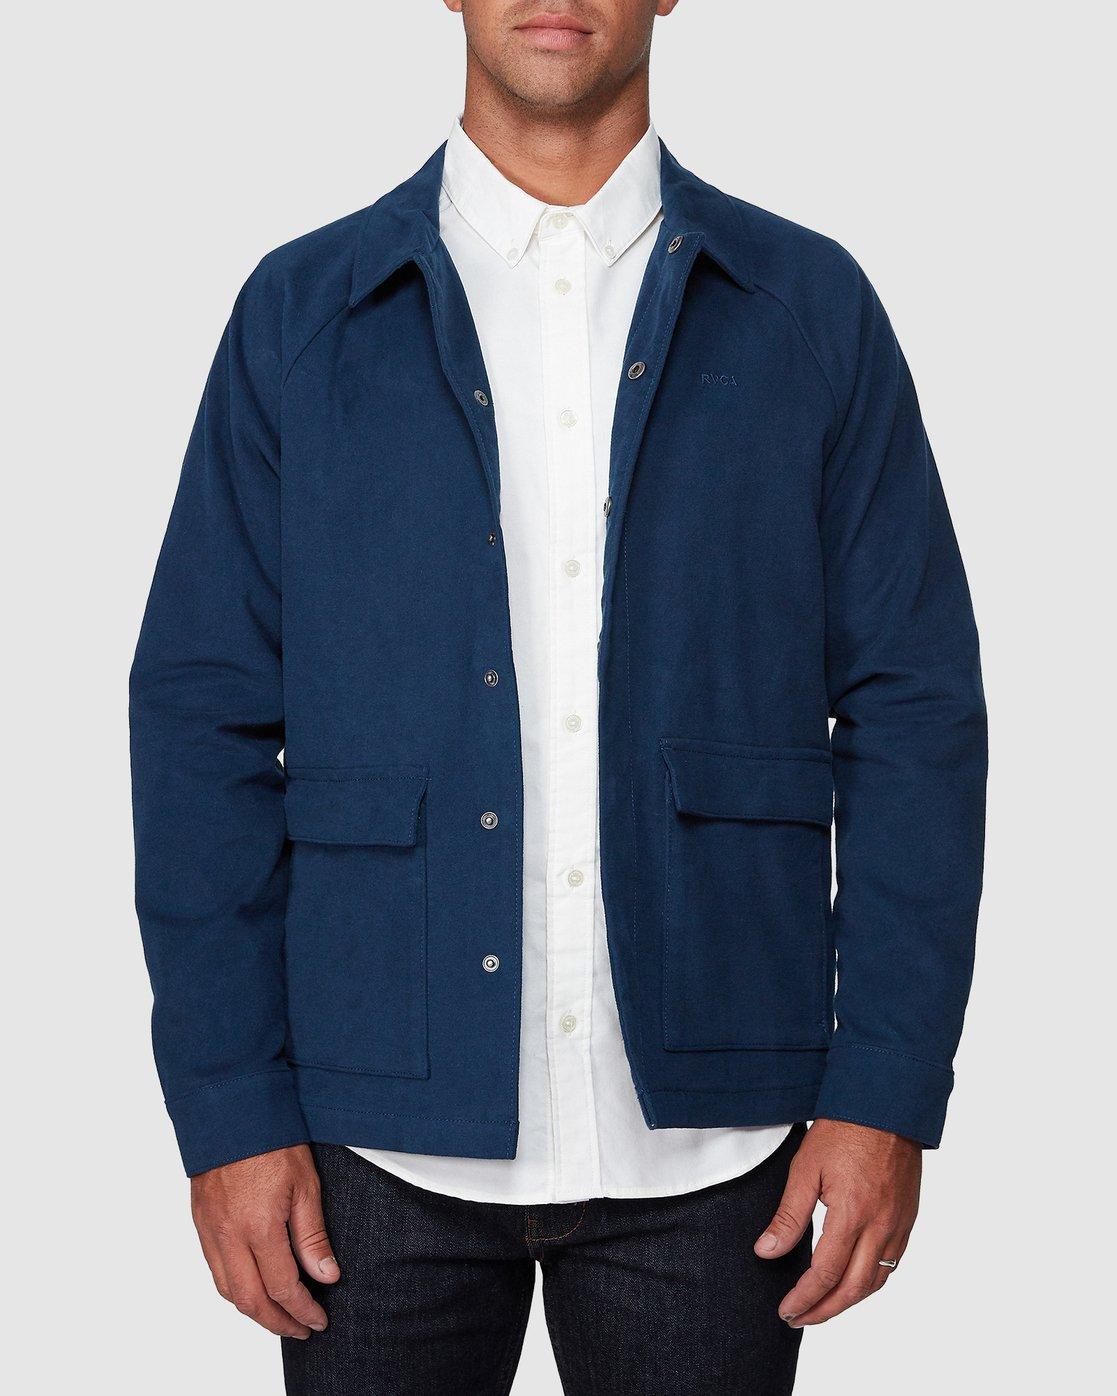 1 RVCA Cairo Jacket Blue R107437 RVCA